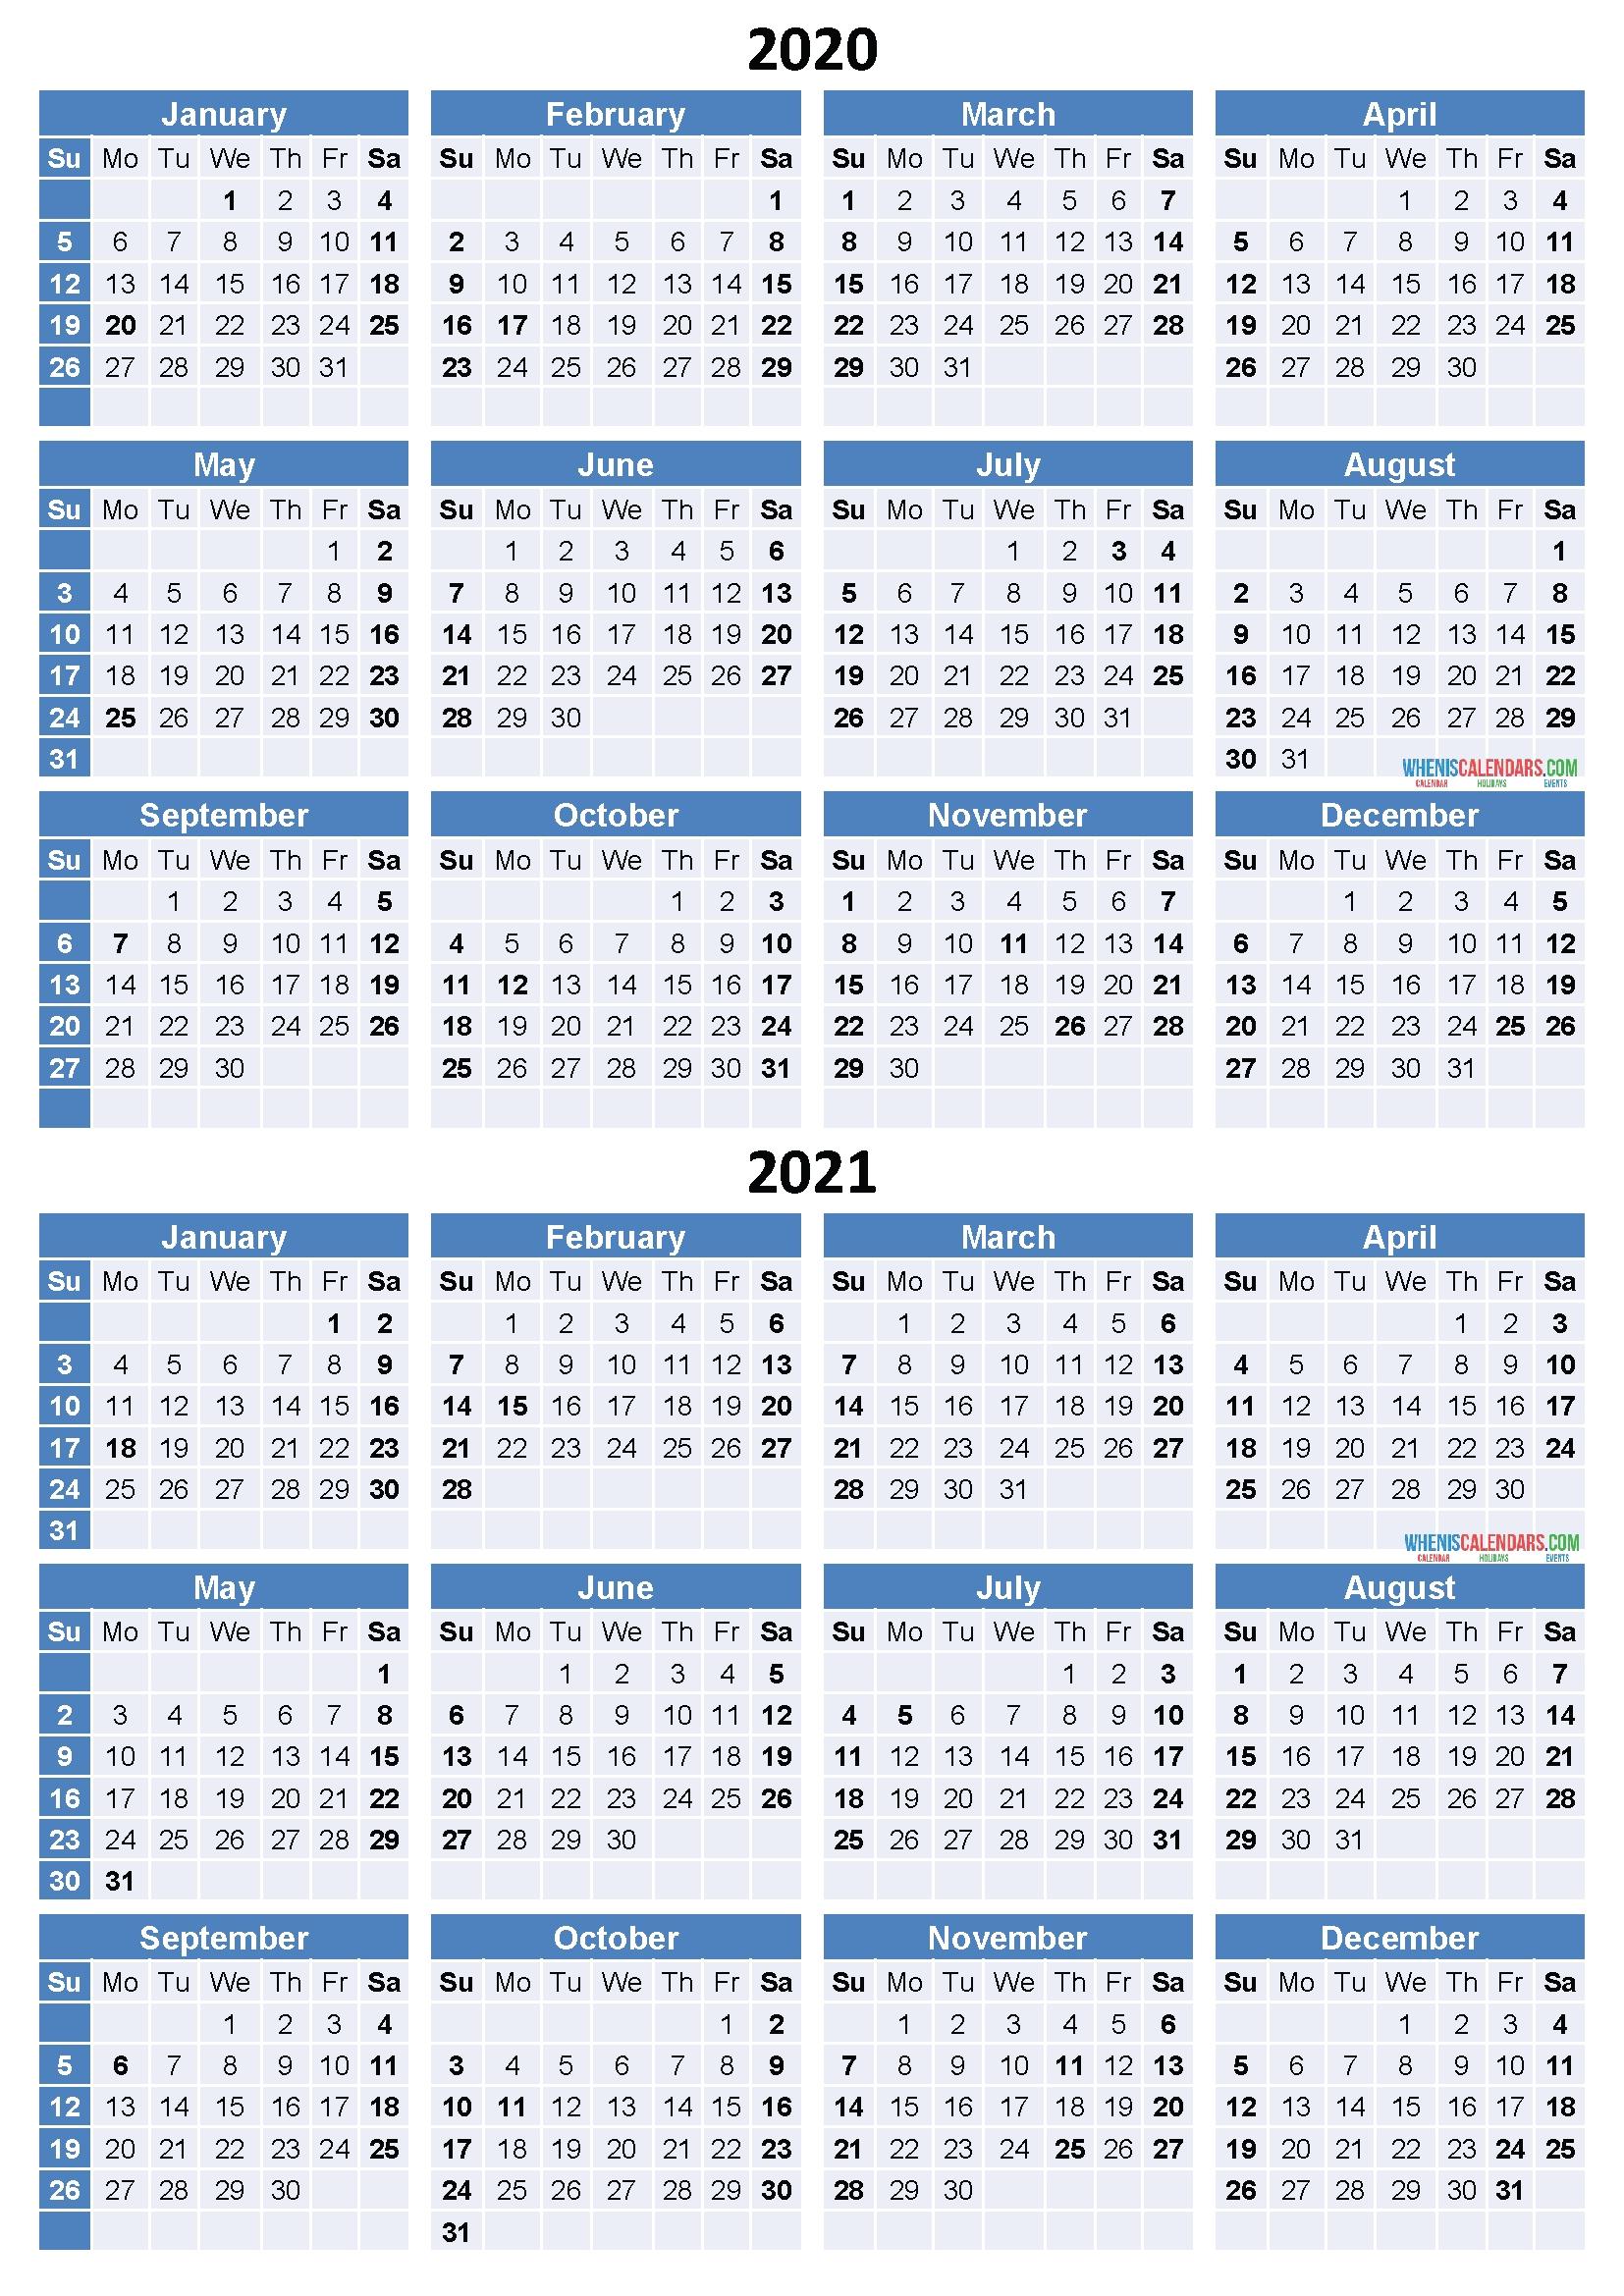 Depo Provera Calendar 2021 Printable   Calendar Printables pertaining to 3 Month Blank Printable Calendar 2021